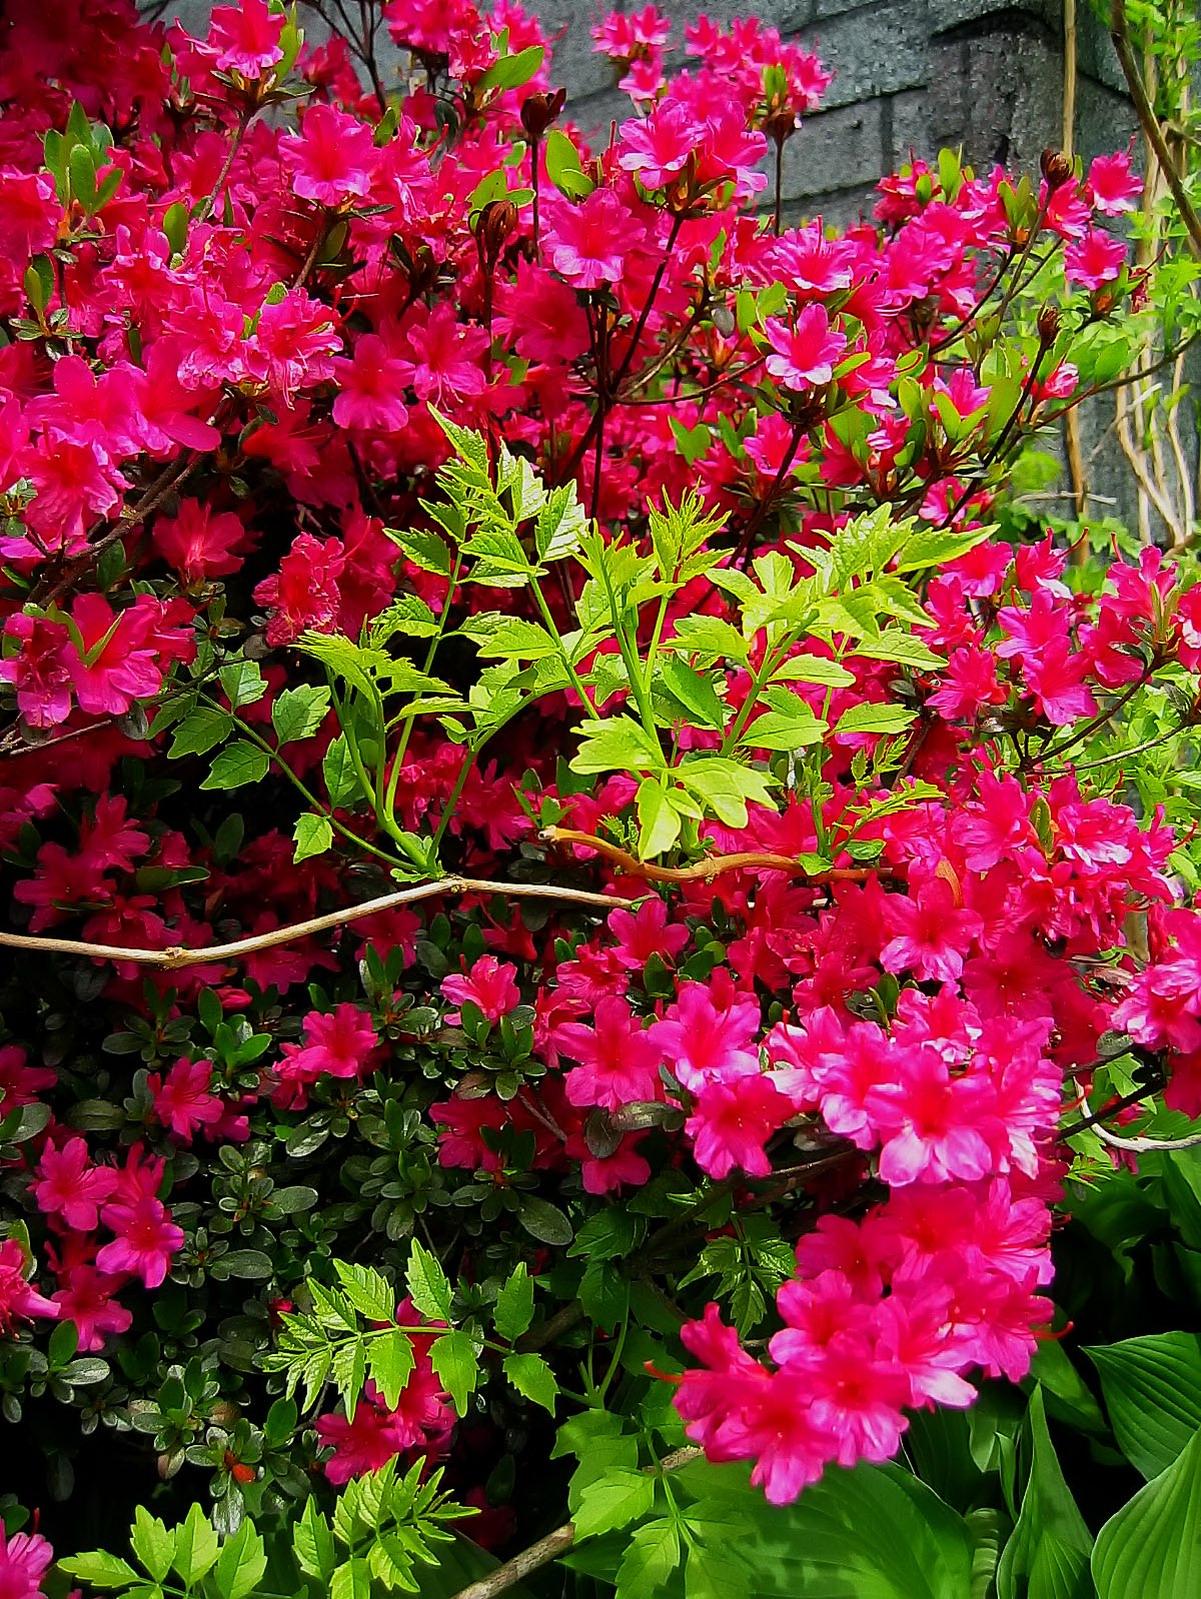 A newly emerging garden of Azalea blooms.